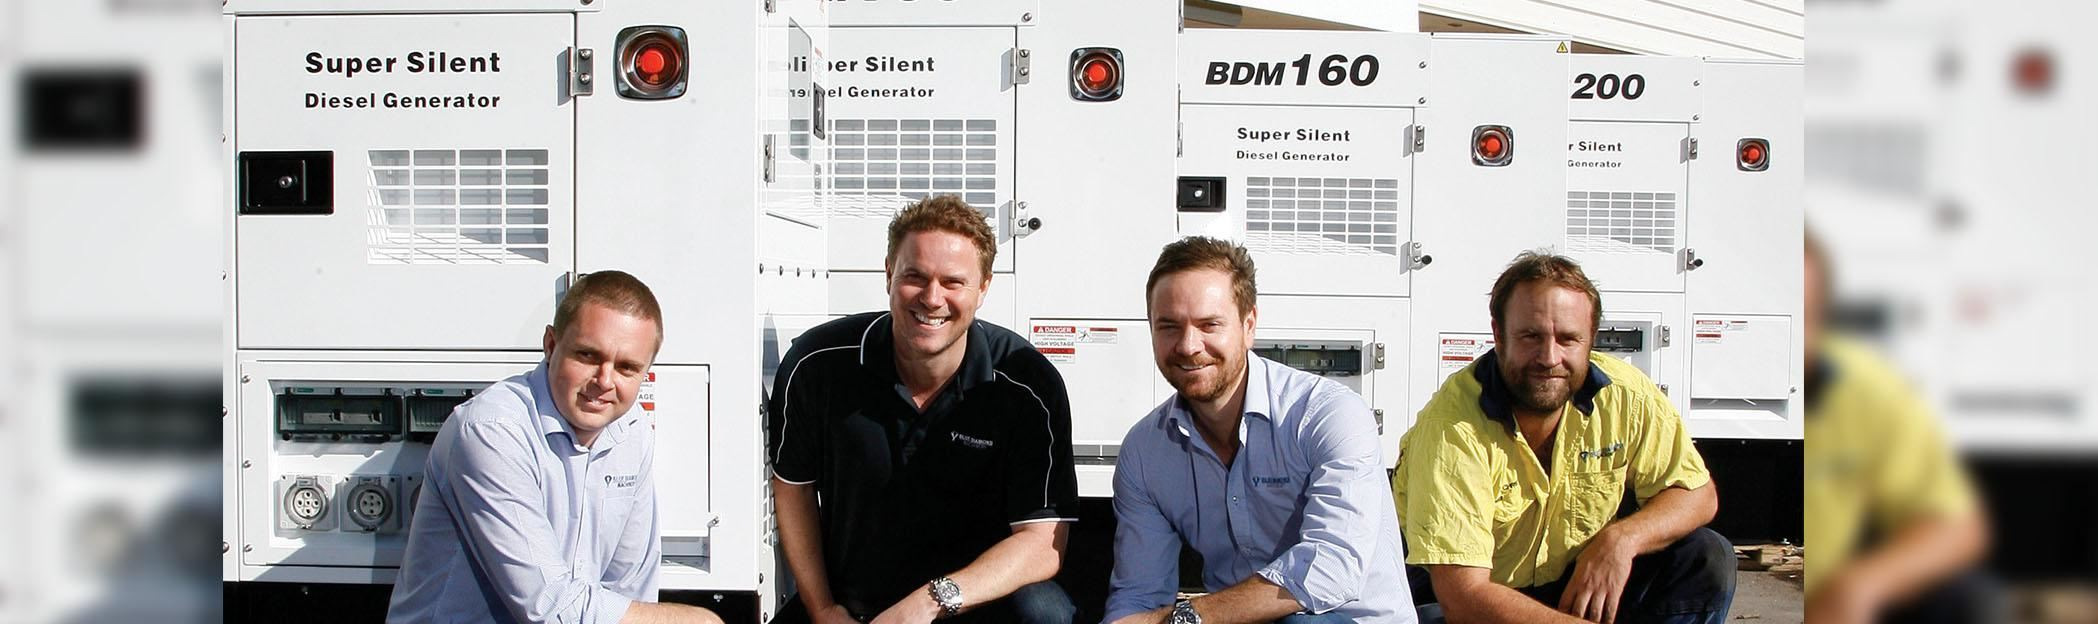 Generators- Petrol and Diesel Generators Australia for Home and Industrial Use